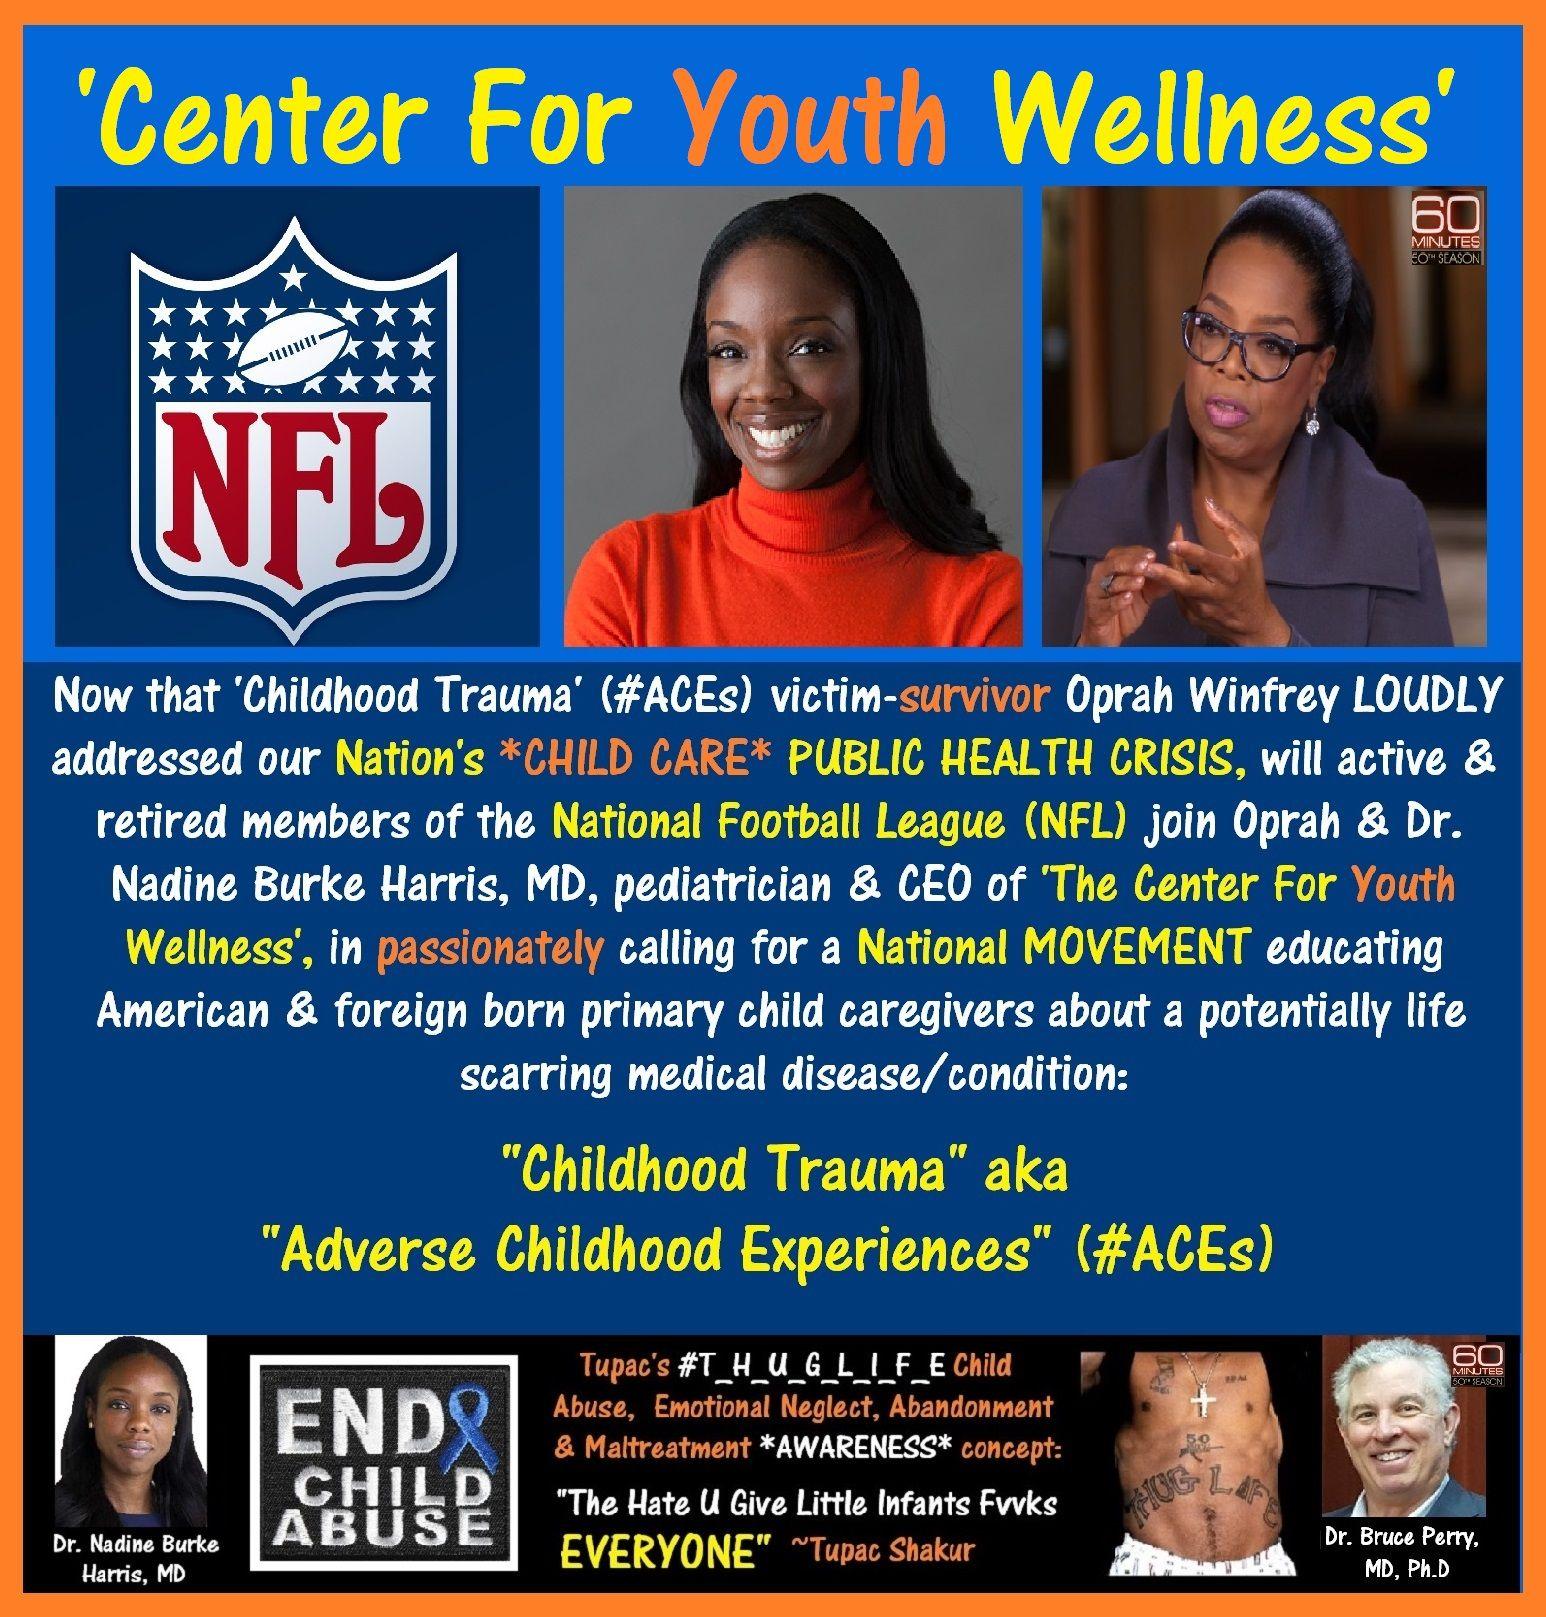 NFL, Oprah Winfrey, Dr. Nadine Burke Harris.jpg